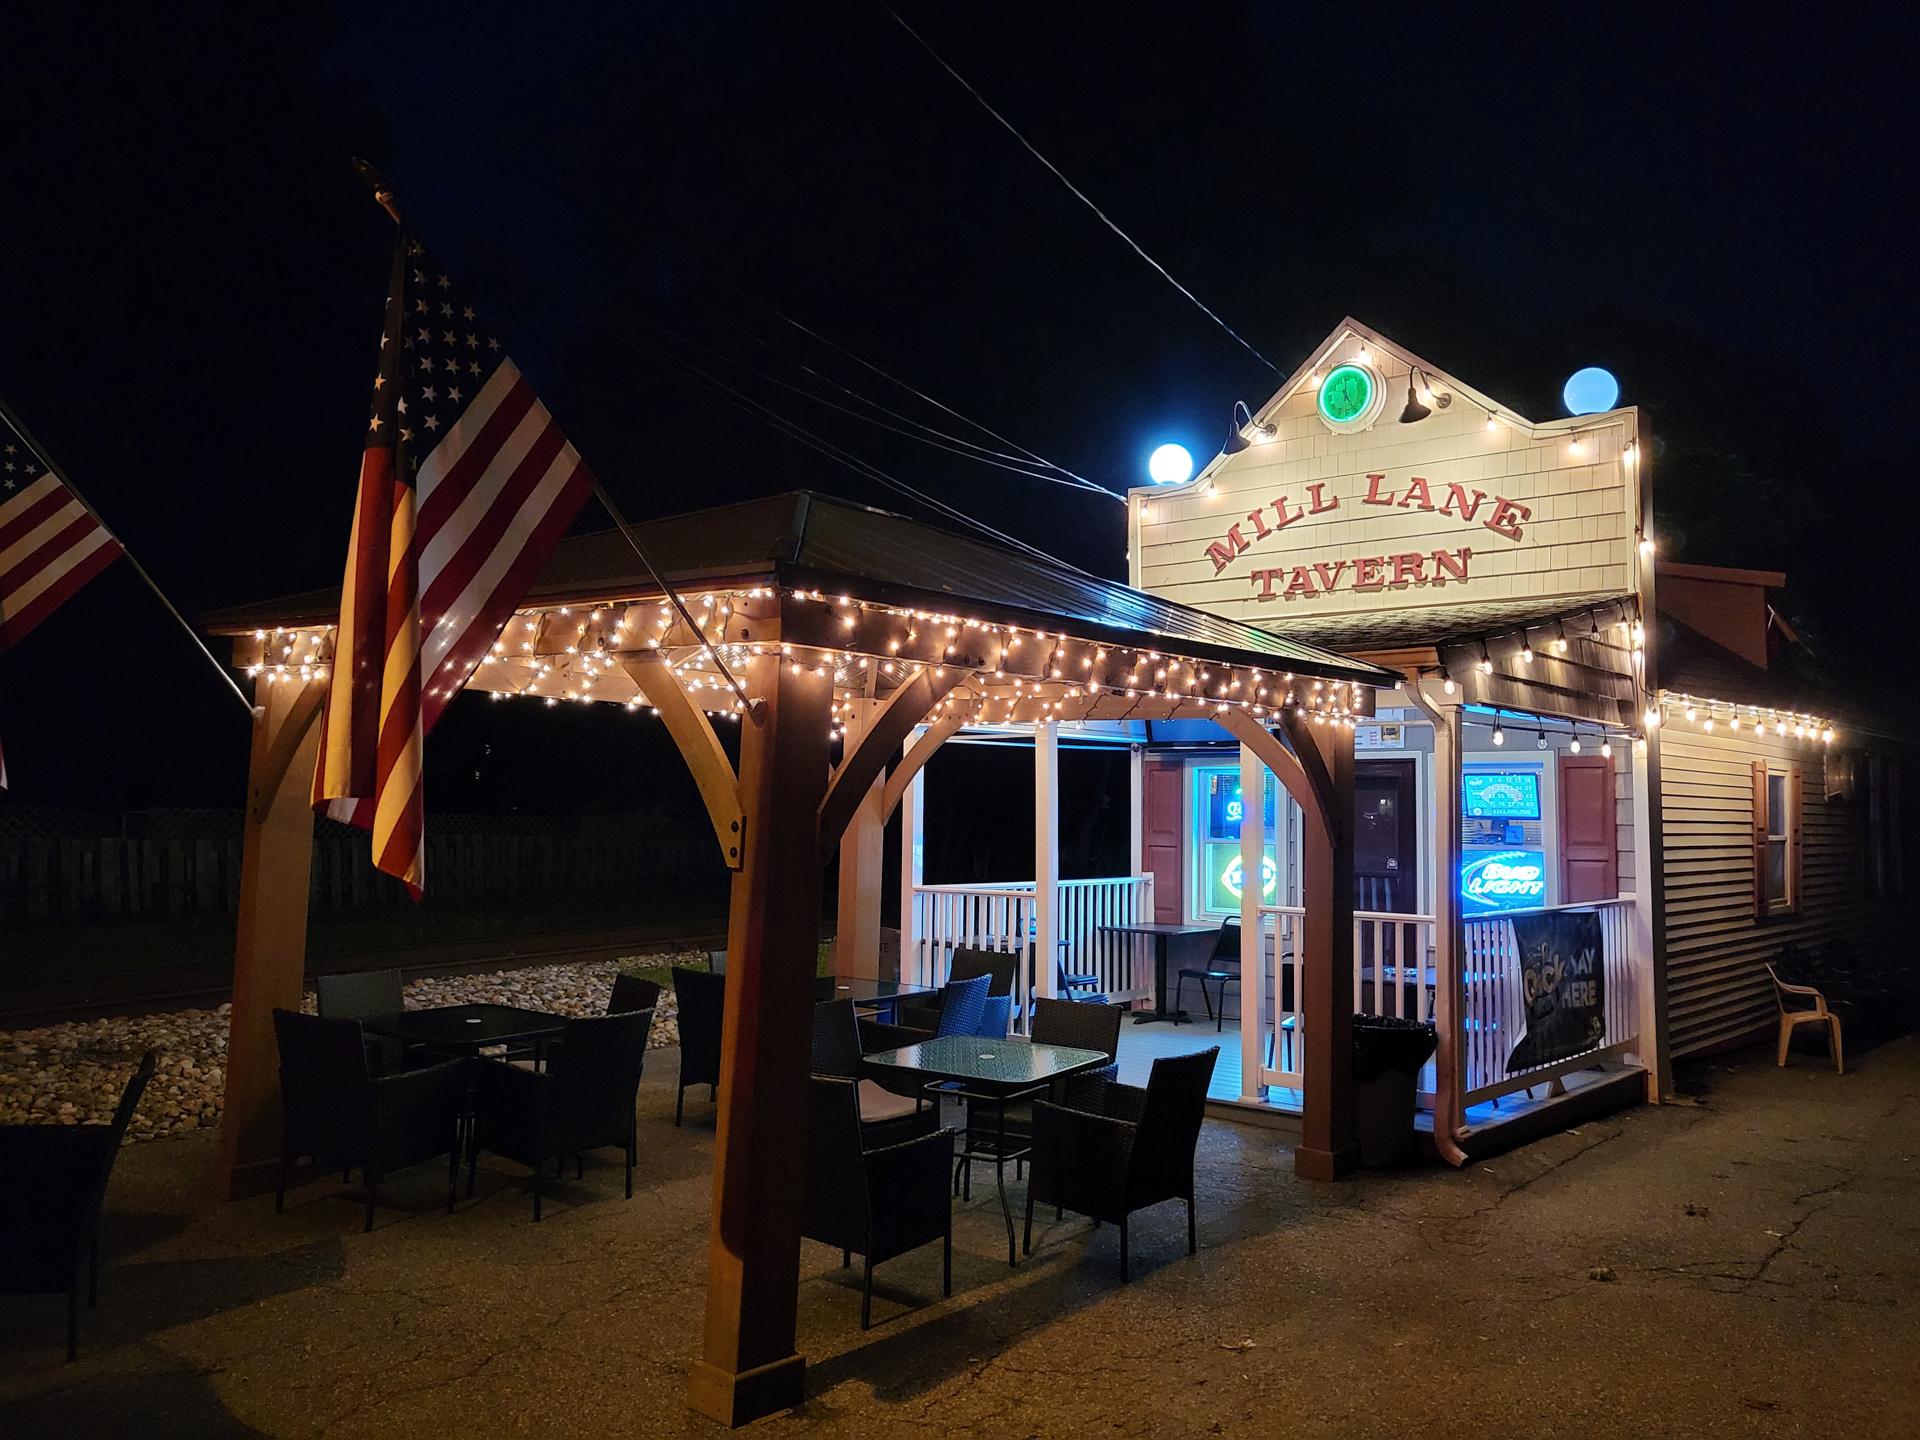 Samsung Galaxy Z Flip 3 photo sample Mill Lane Tavern at night